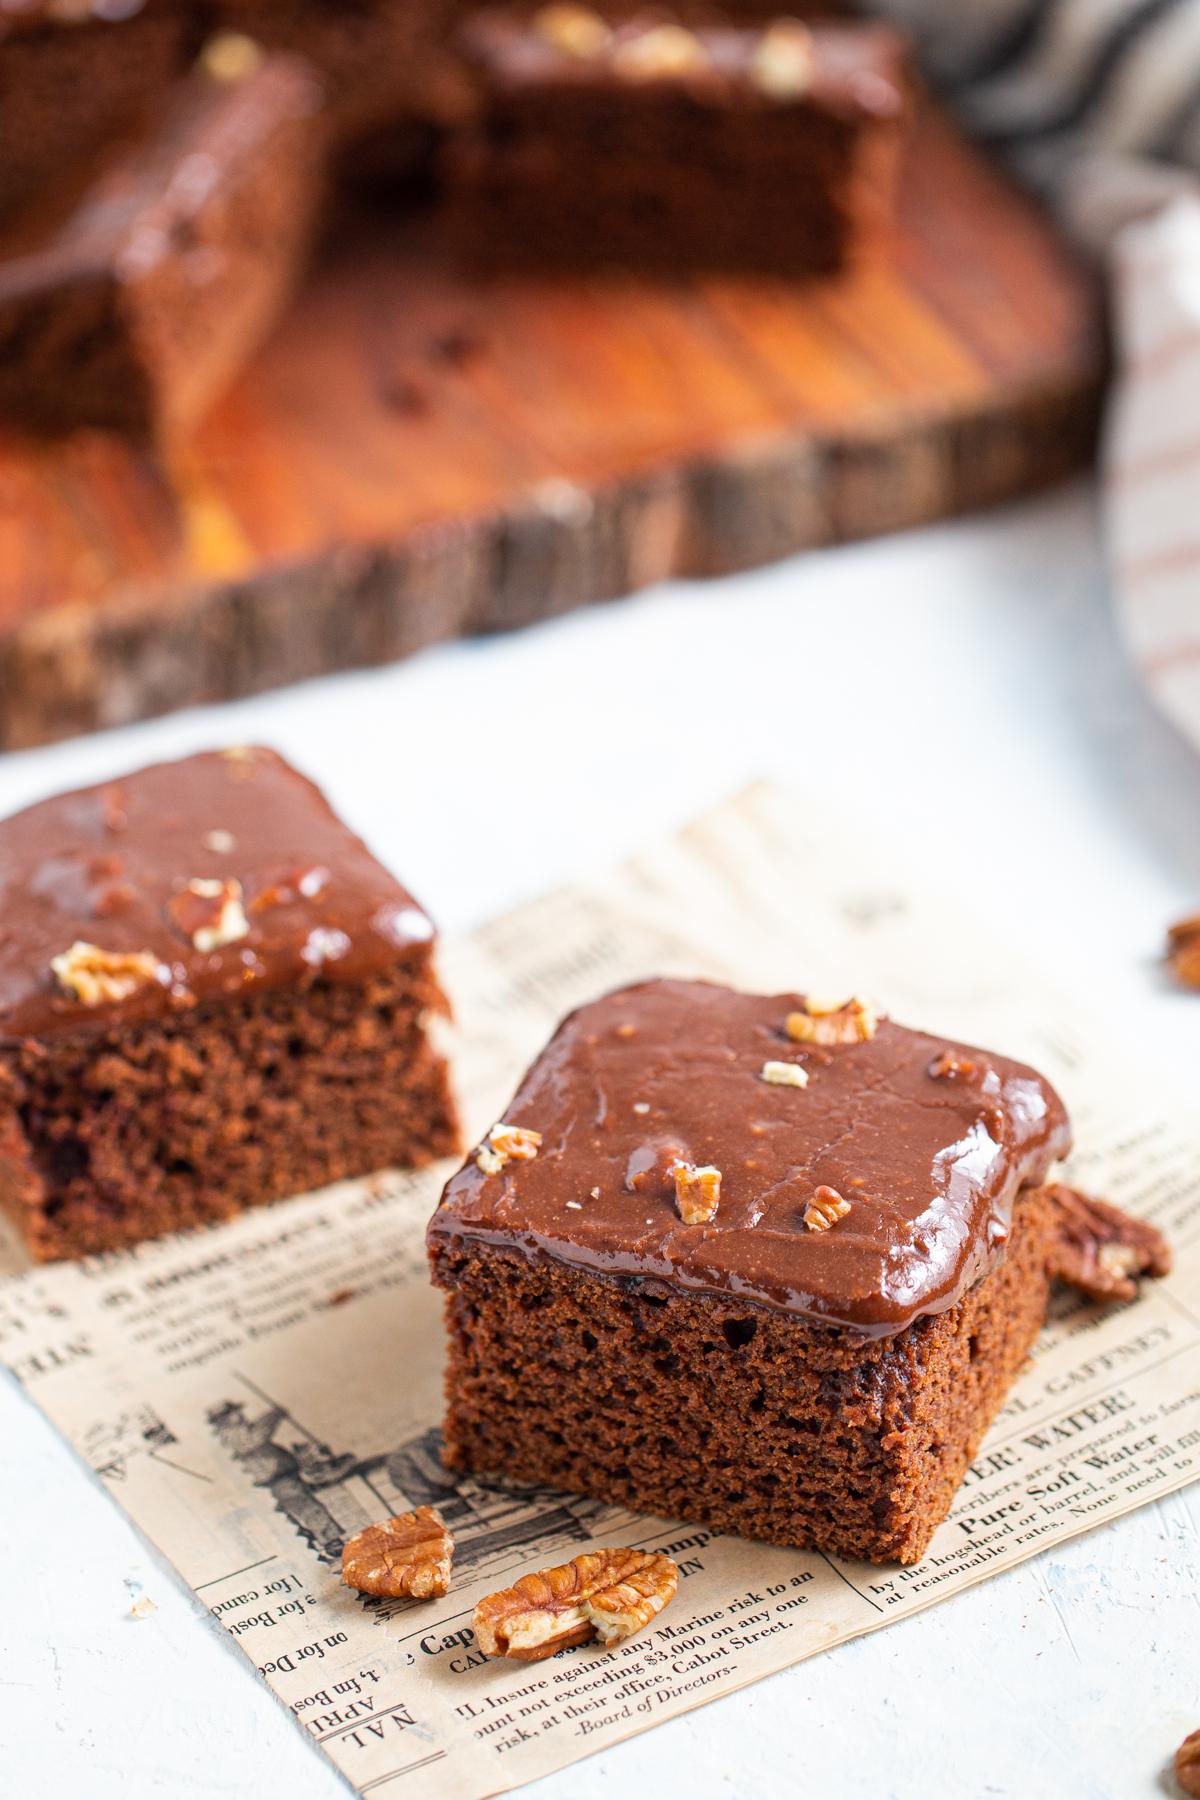 slice of chocolate cake on countertop